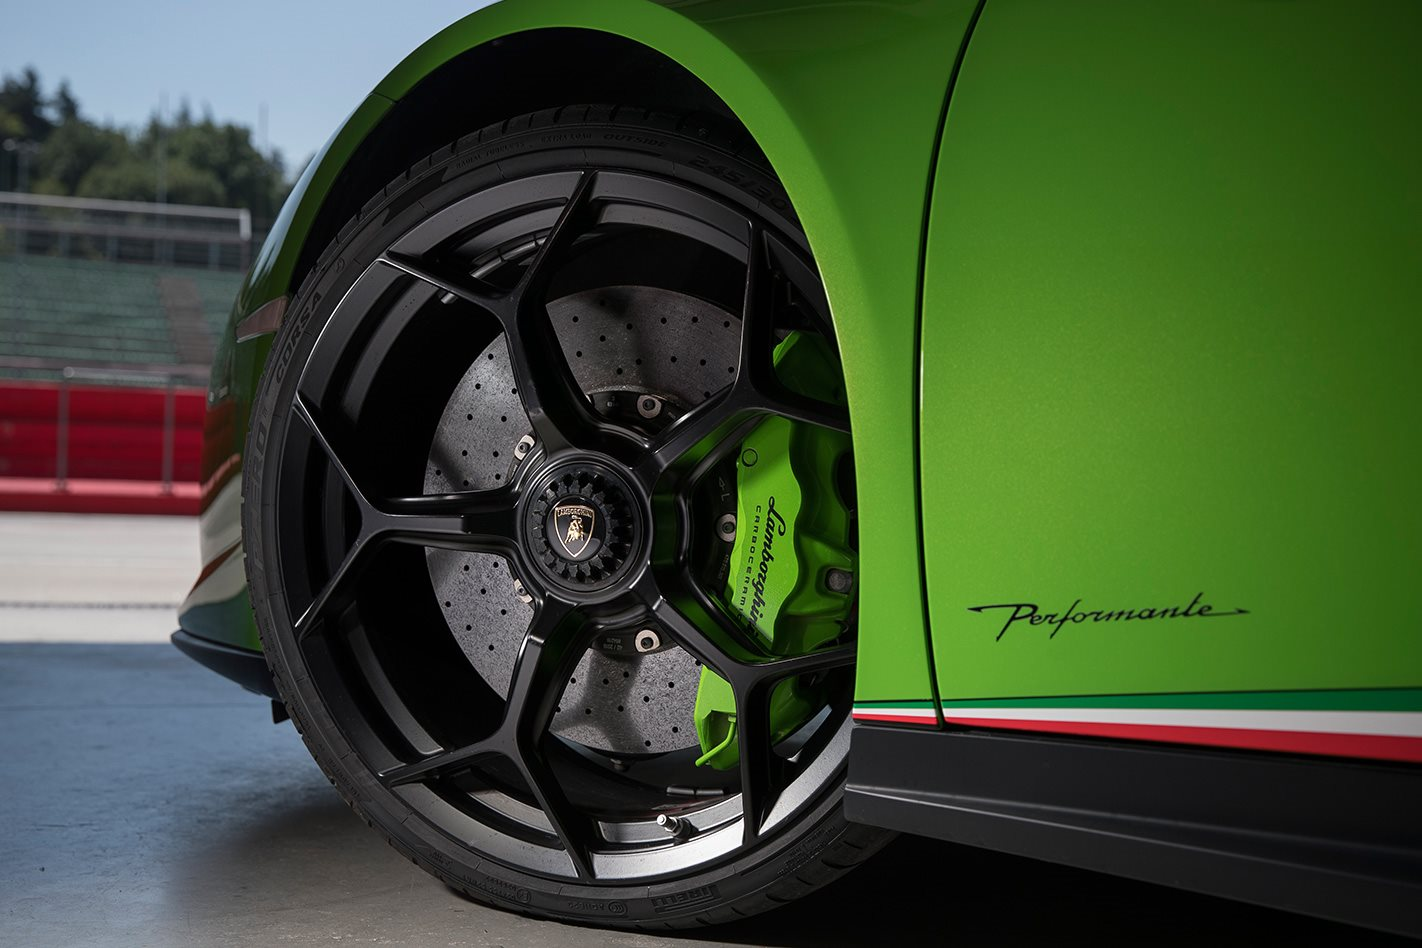 2017 Lamborghini Huracan Performante wheel